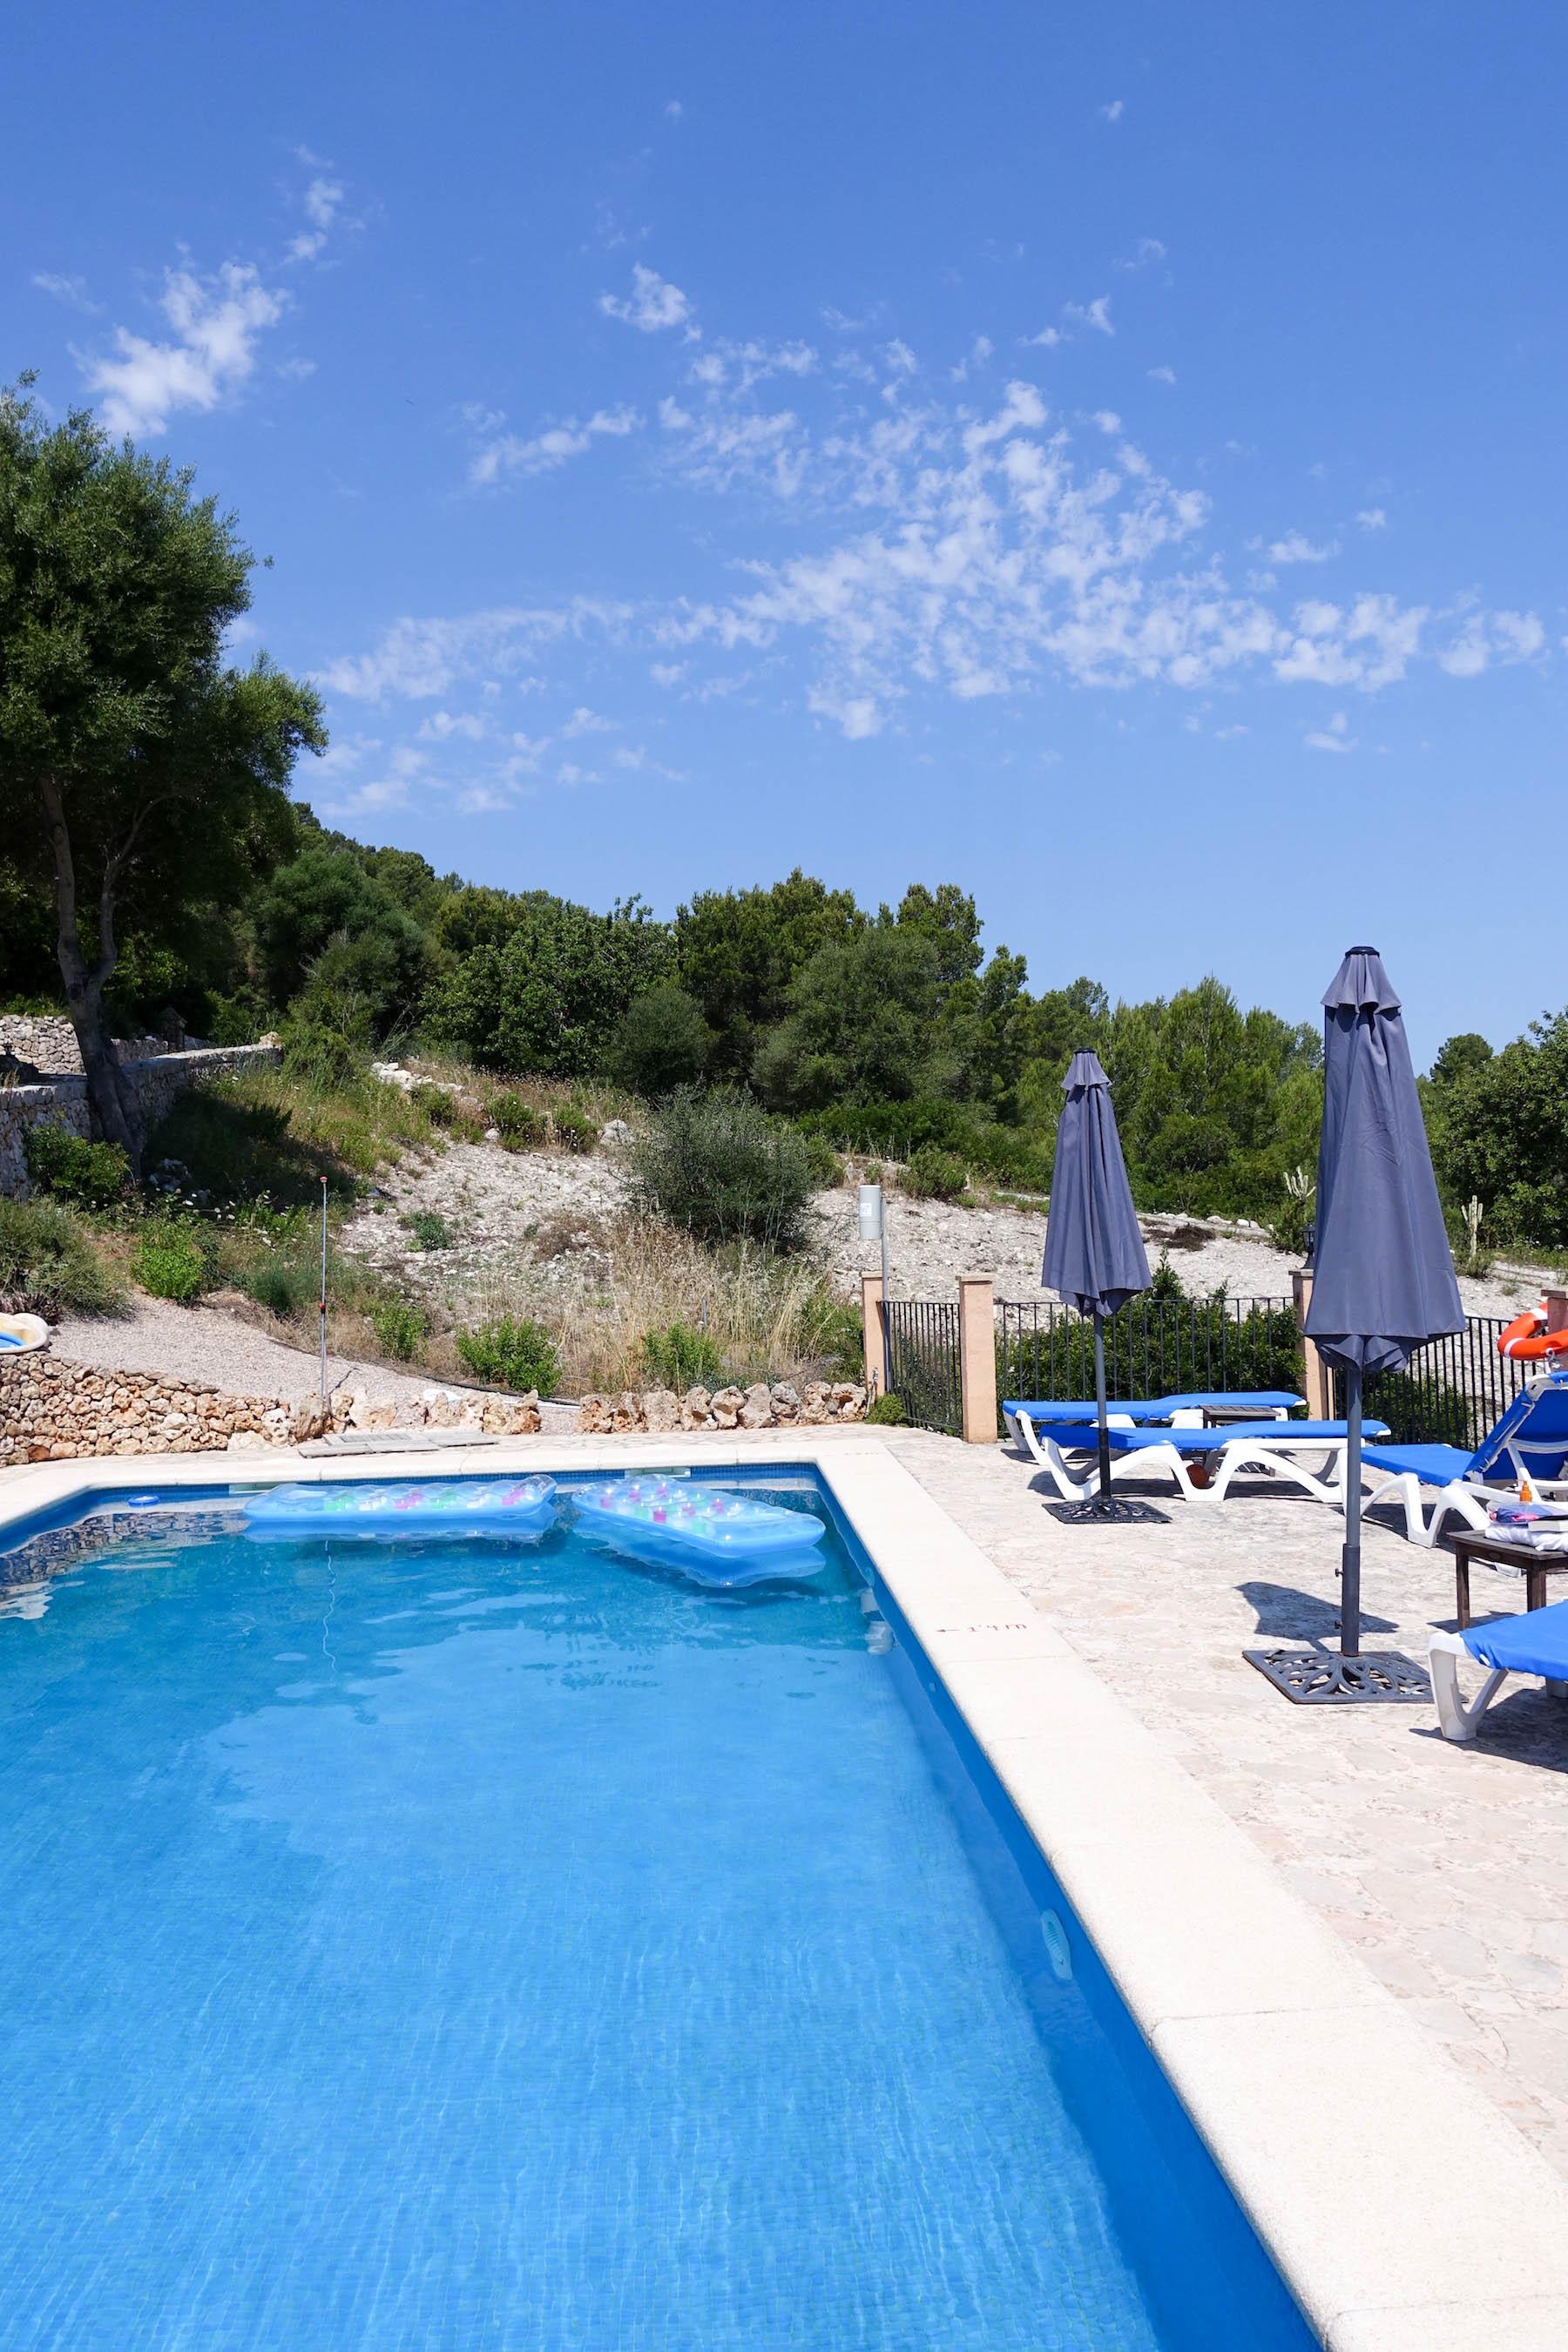 suelovesnyc_susan_fengler_finca_hotel_mallorca_fincahotel_mallorca_es_picot_pool